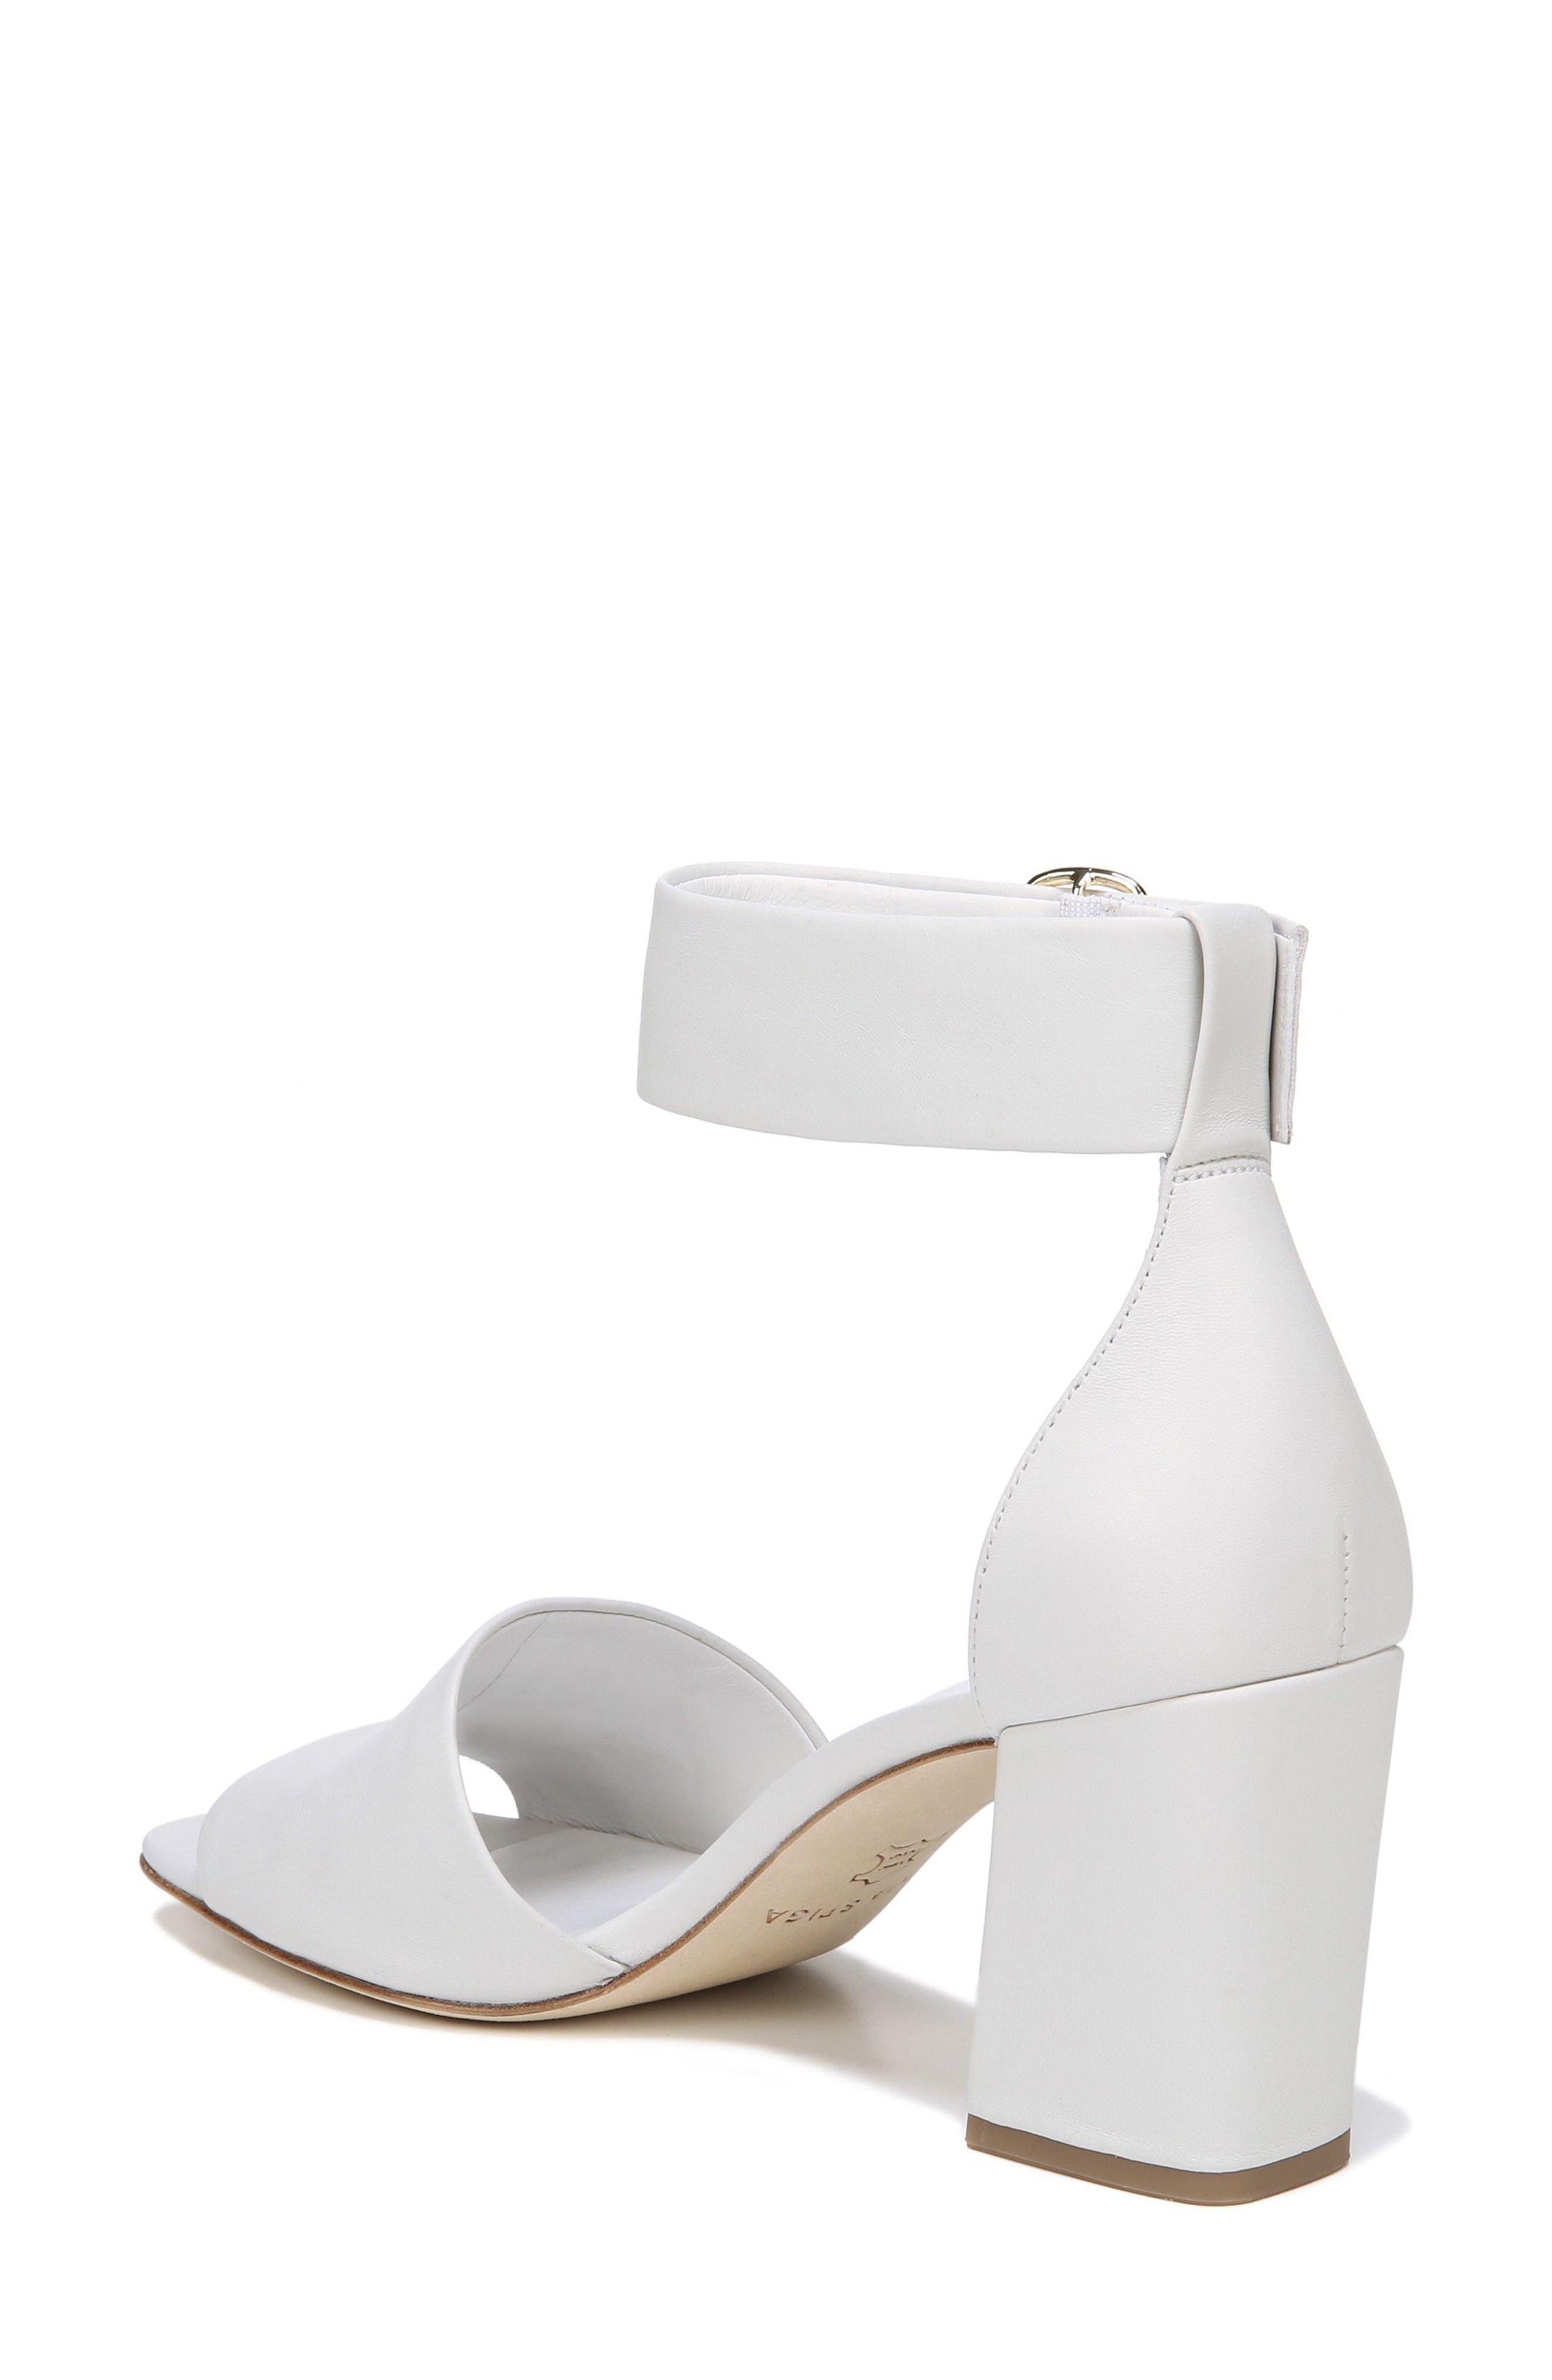 Evonne Ankle Strap Sandal,                             Alternate thumbnail 2, color,                             Porcelain Leather